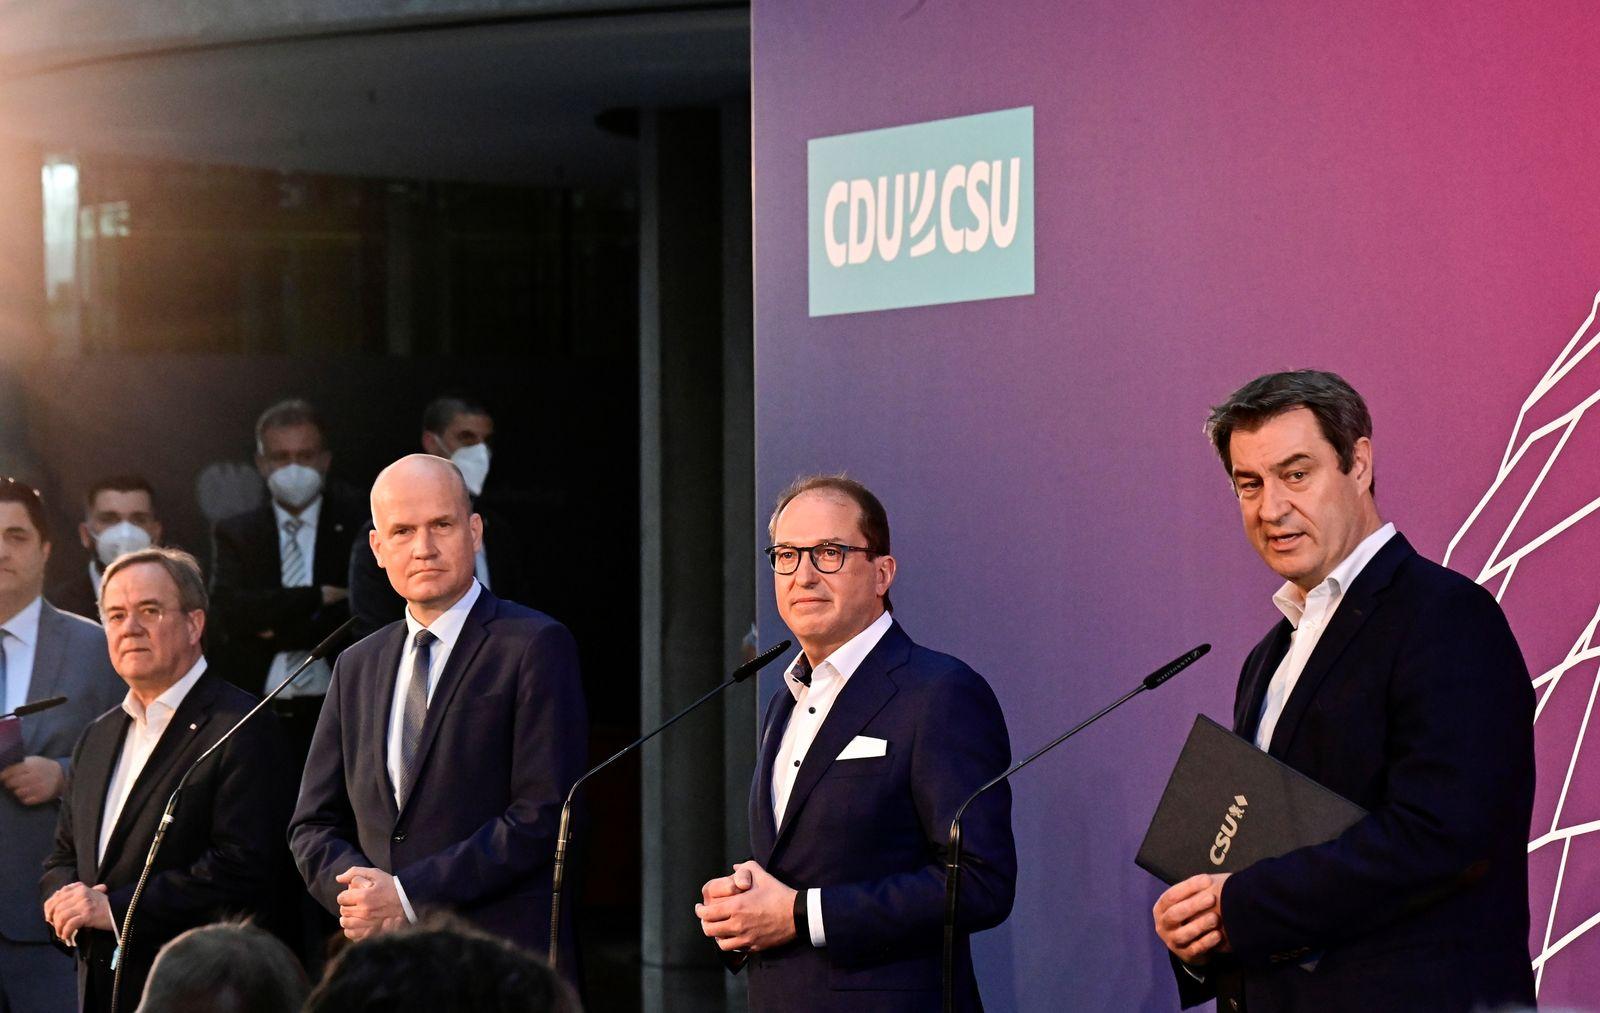 Armin Laschet, Ralph Brinkhaus, Alexander Dobrindt and Markus Soeder attend a news conference in Berlin